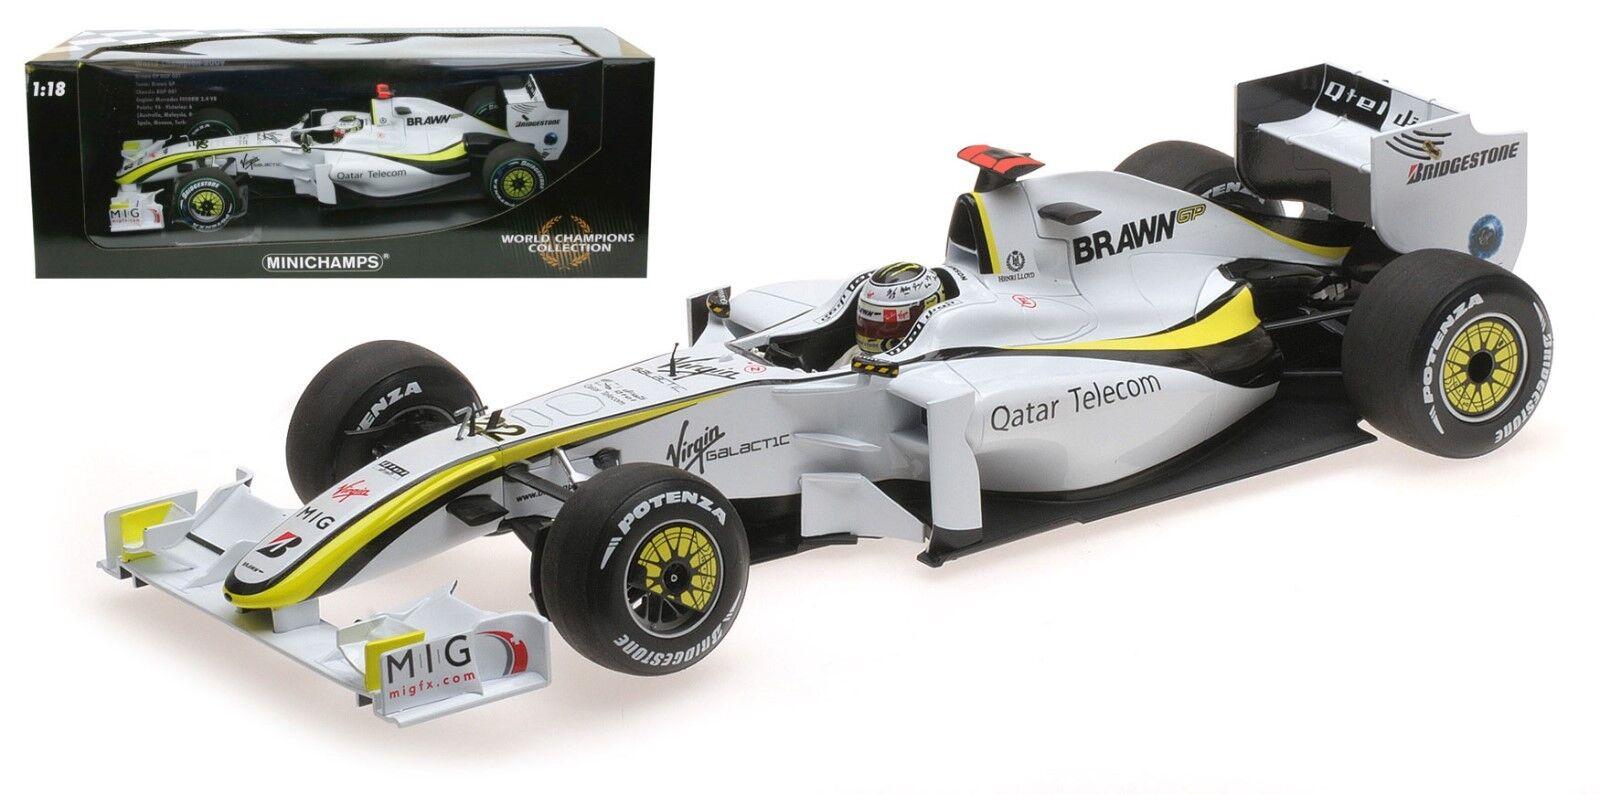 Minichamps Brawn BGP001 2009 - Jenson Button 2009 F1 World Champion 1 18 Scale